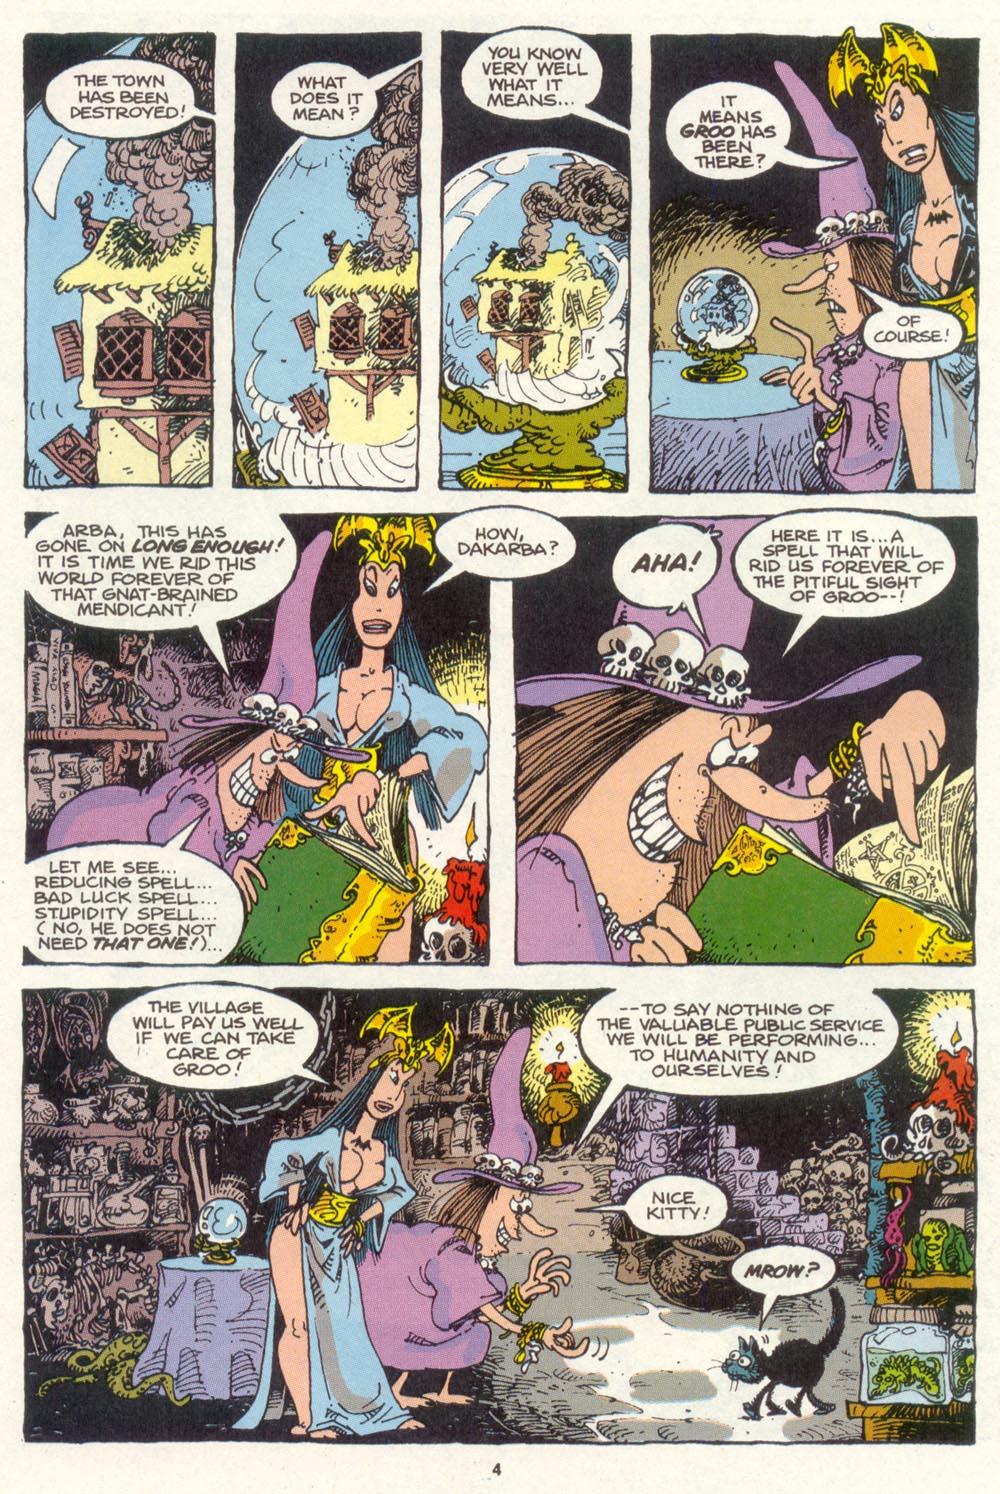 Read online Sergio Aragonés Groo the Wanderer comic -  Issue #85 - 4